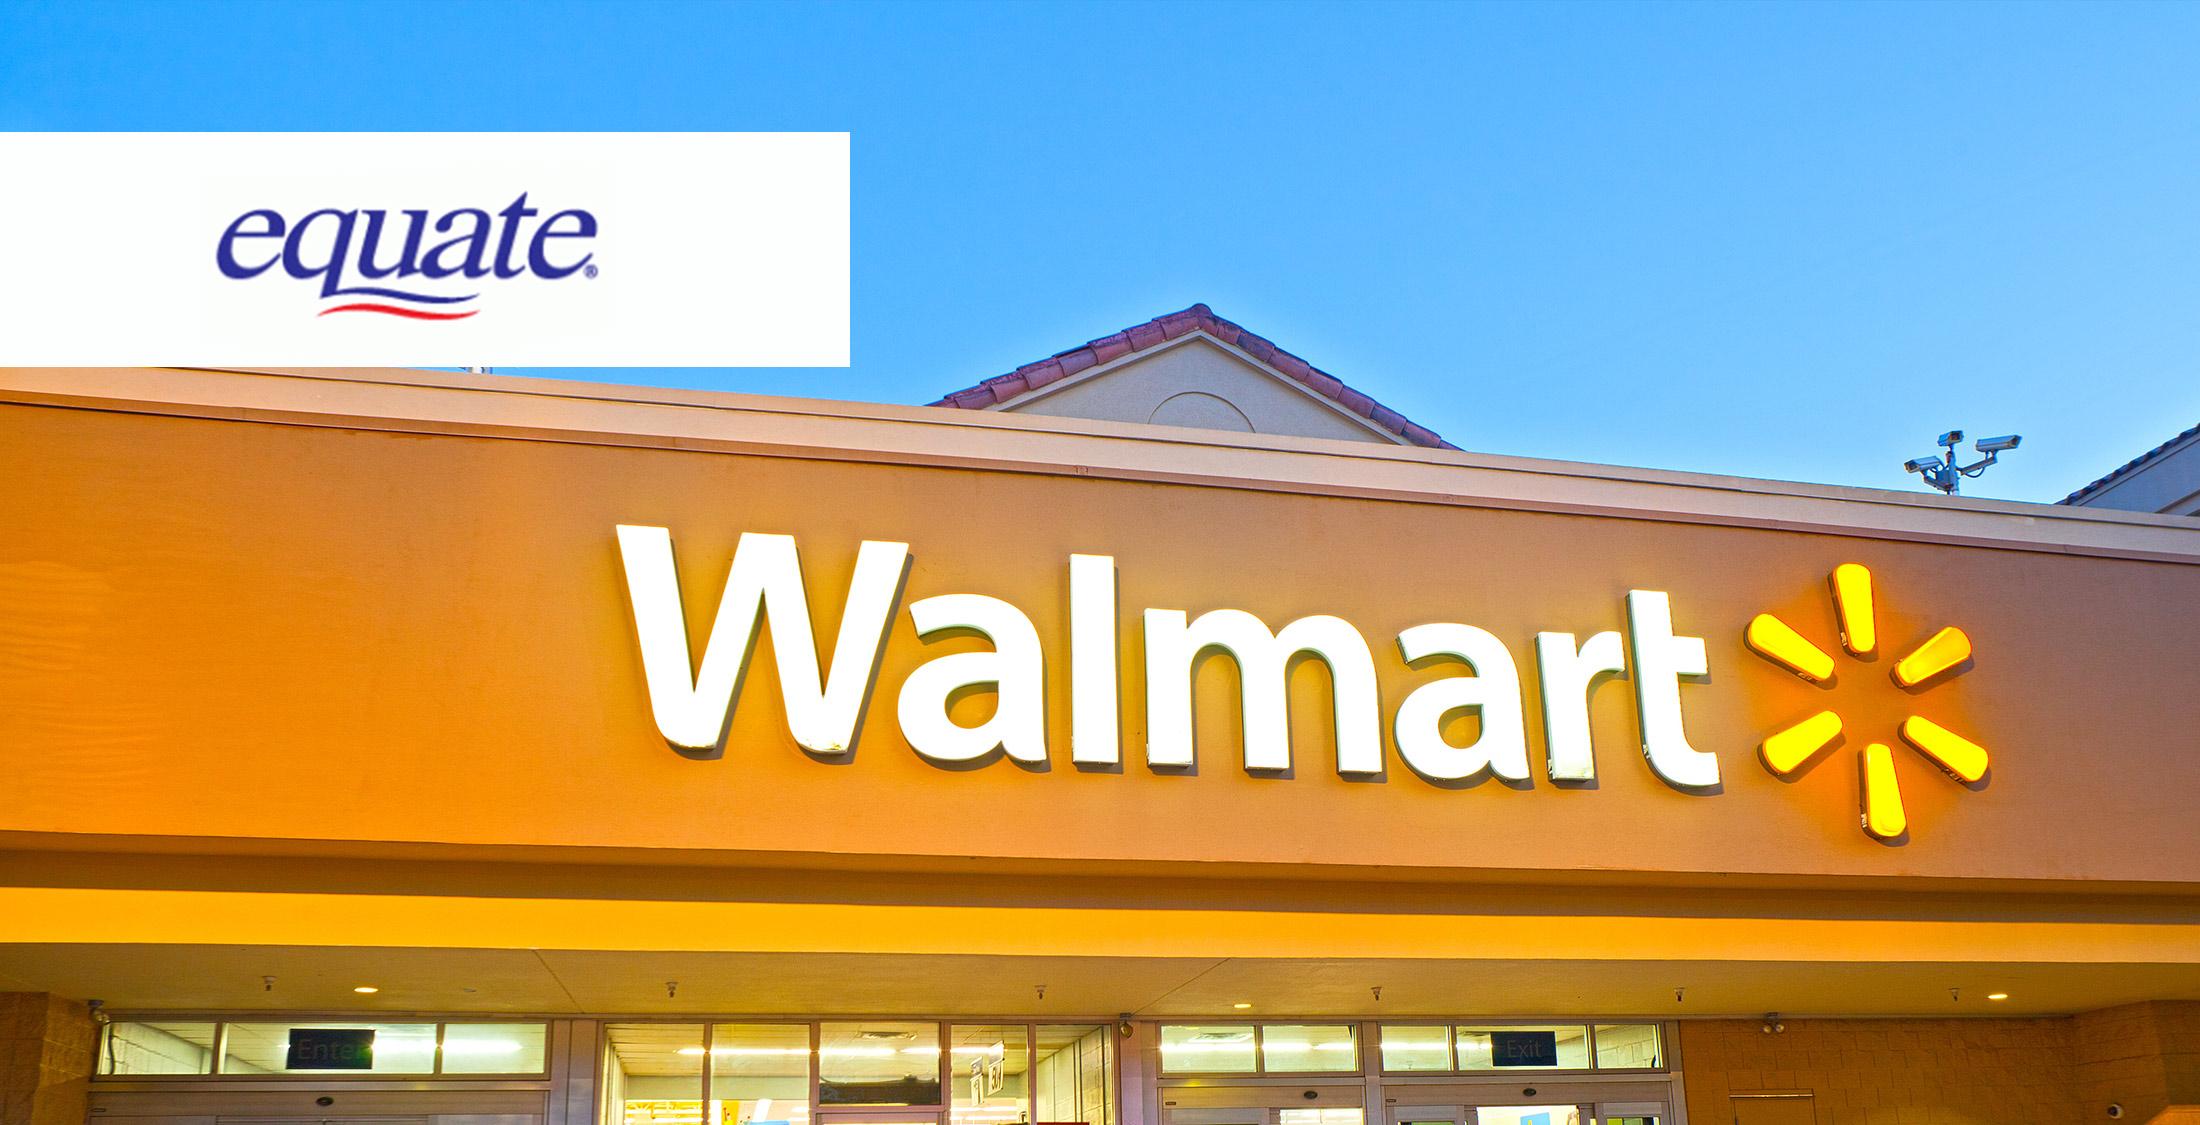 Walmart Equate